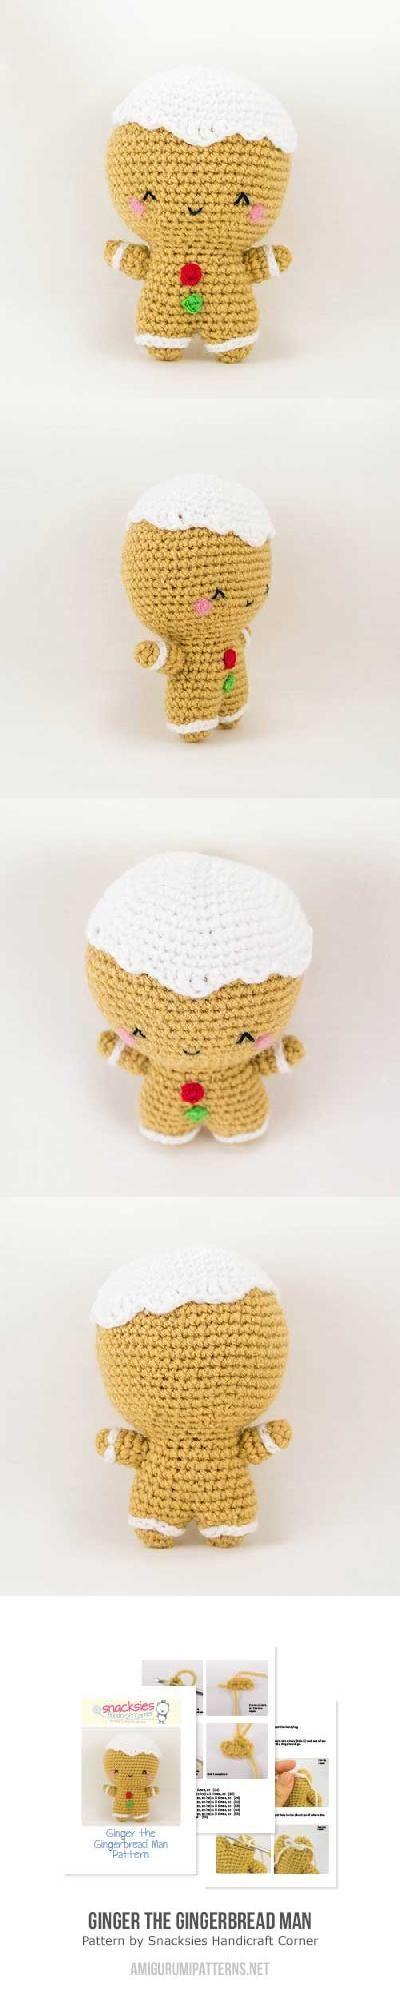 Ginger the gingerbread man amigurumi pattern by Snacksies Handicraft ...